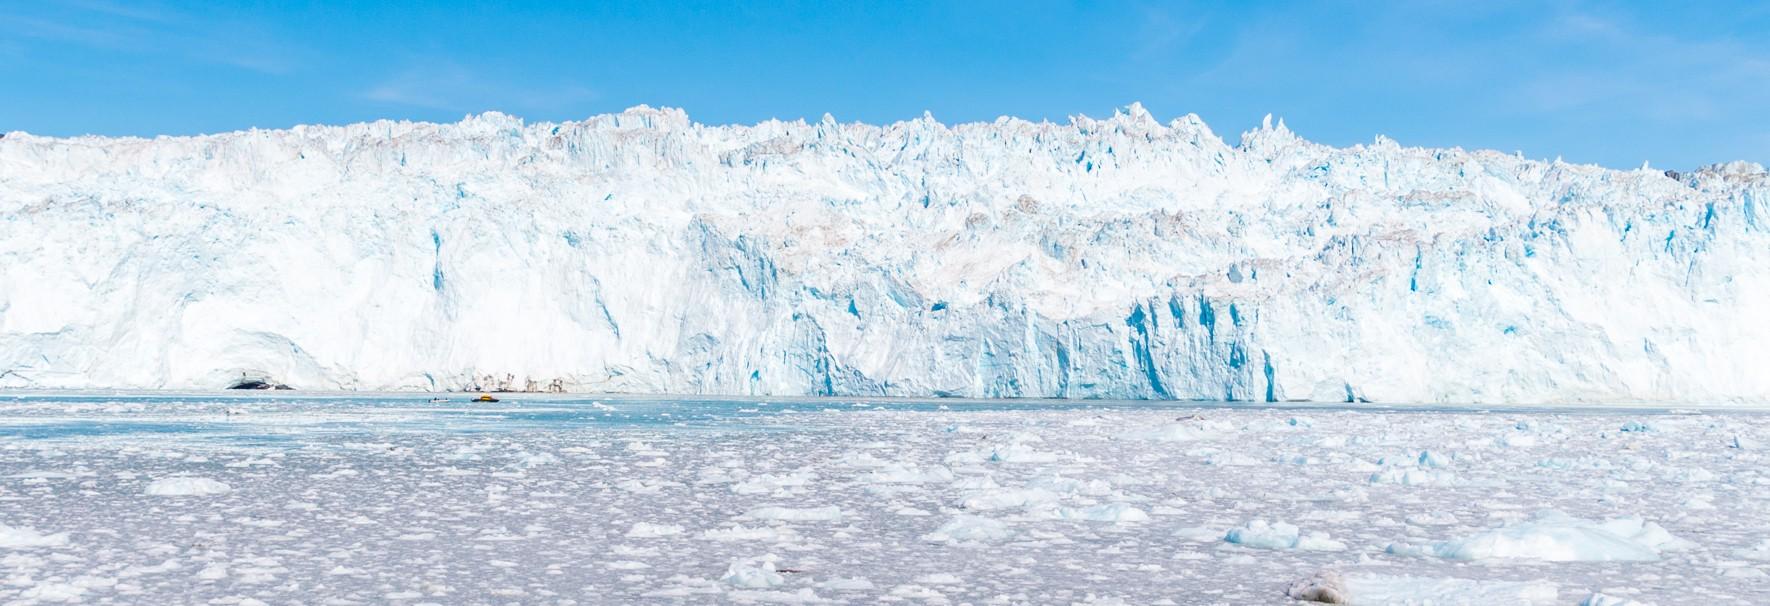 Eqi Glacier boat tour lead image